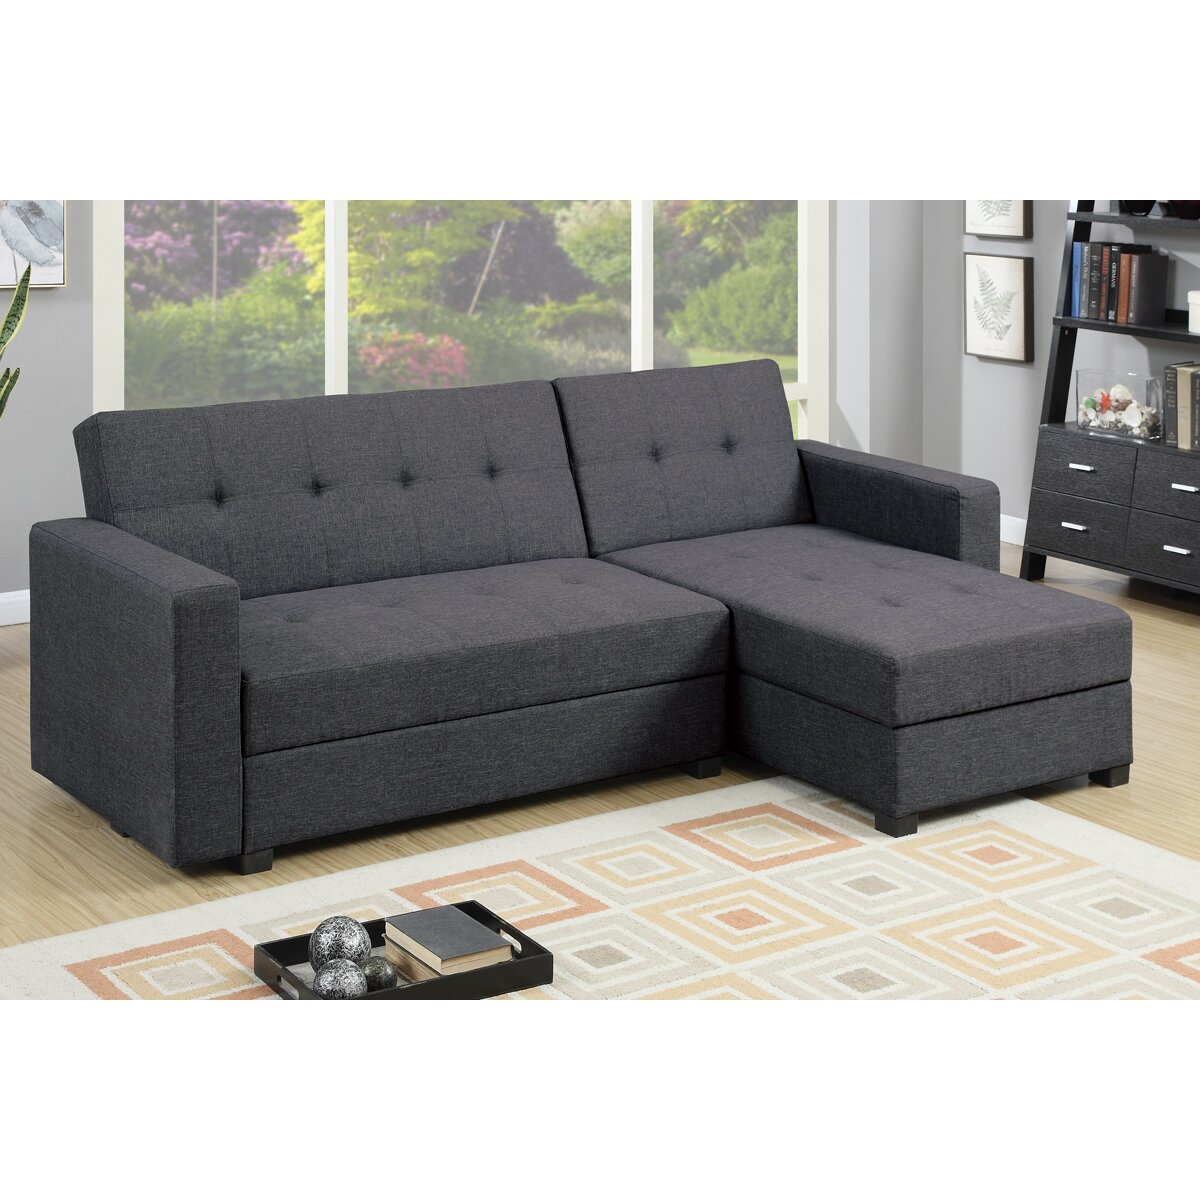 Poundex Sectional White Leather Sofa Chaise: Poundex Bobkona Medora Reversible Chaise Sectional